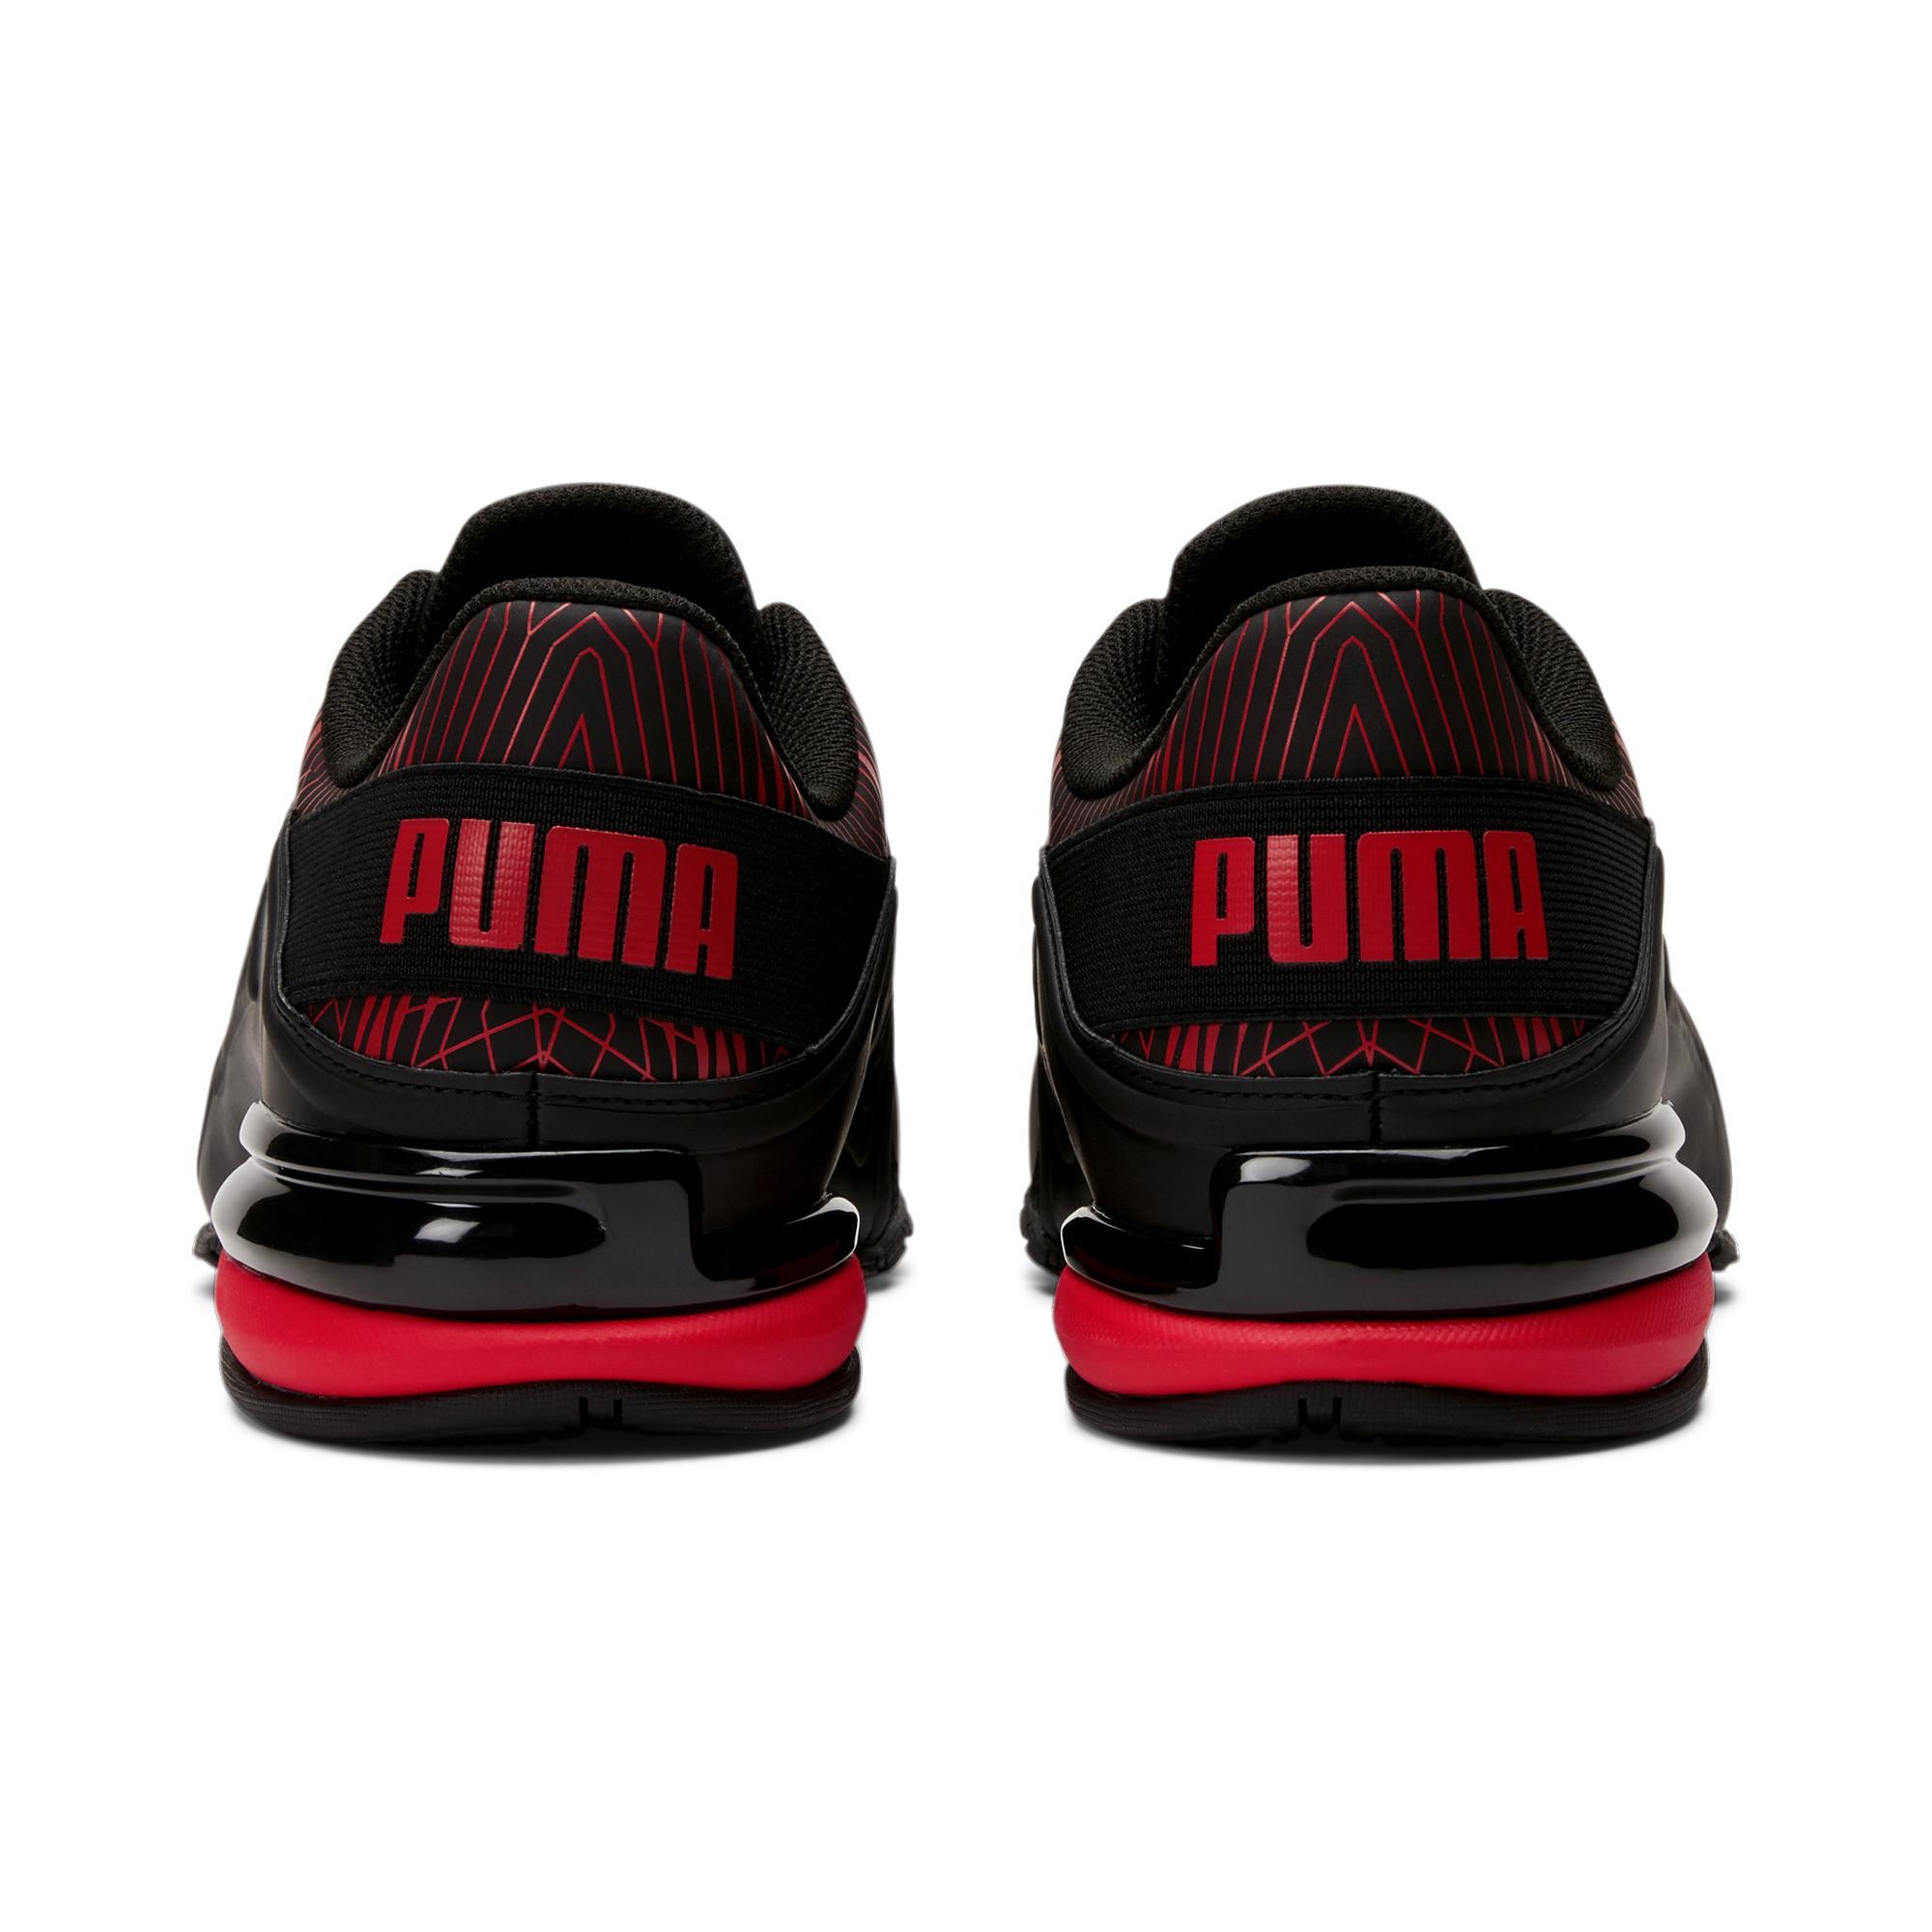 PUMA-Men-039-s-Viz-Runner-Graphic-Sneakers thumbnail 32